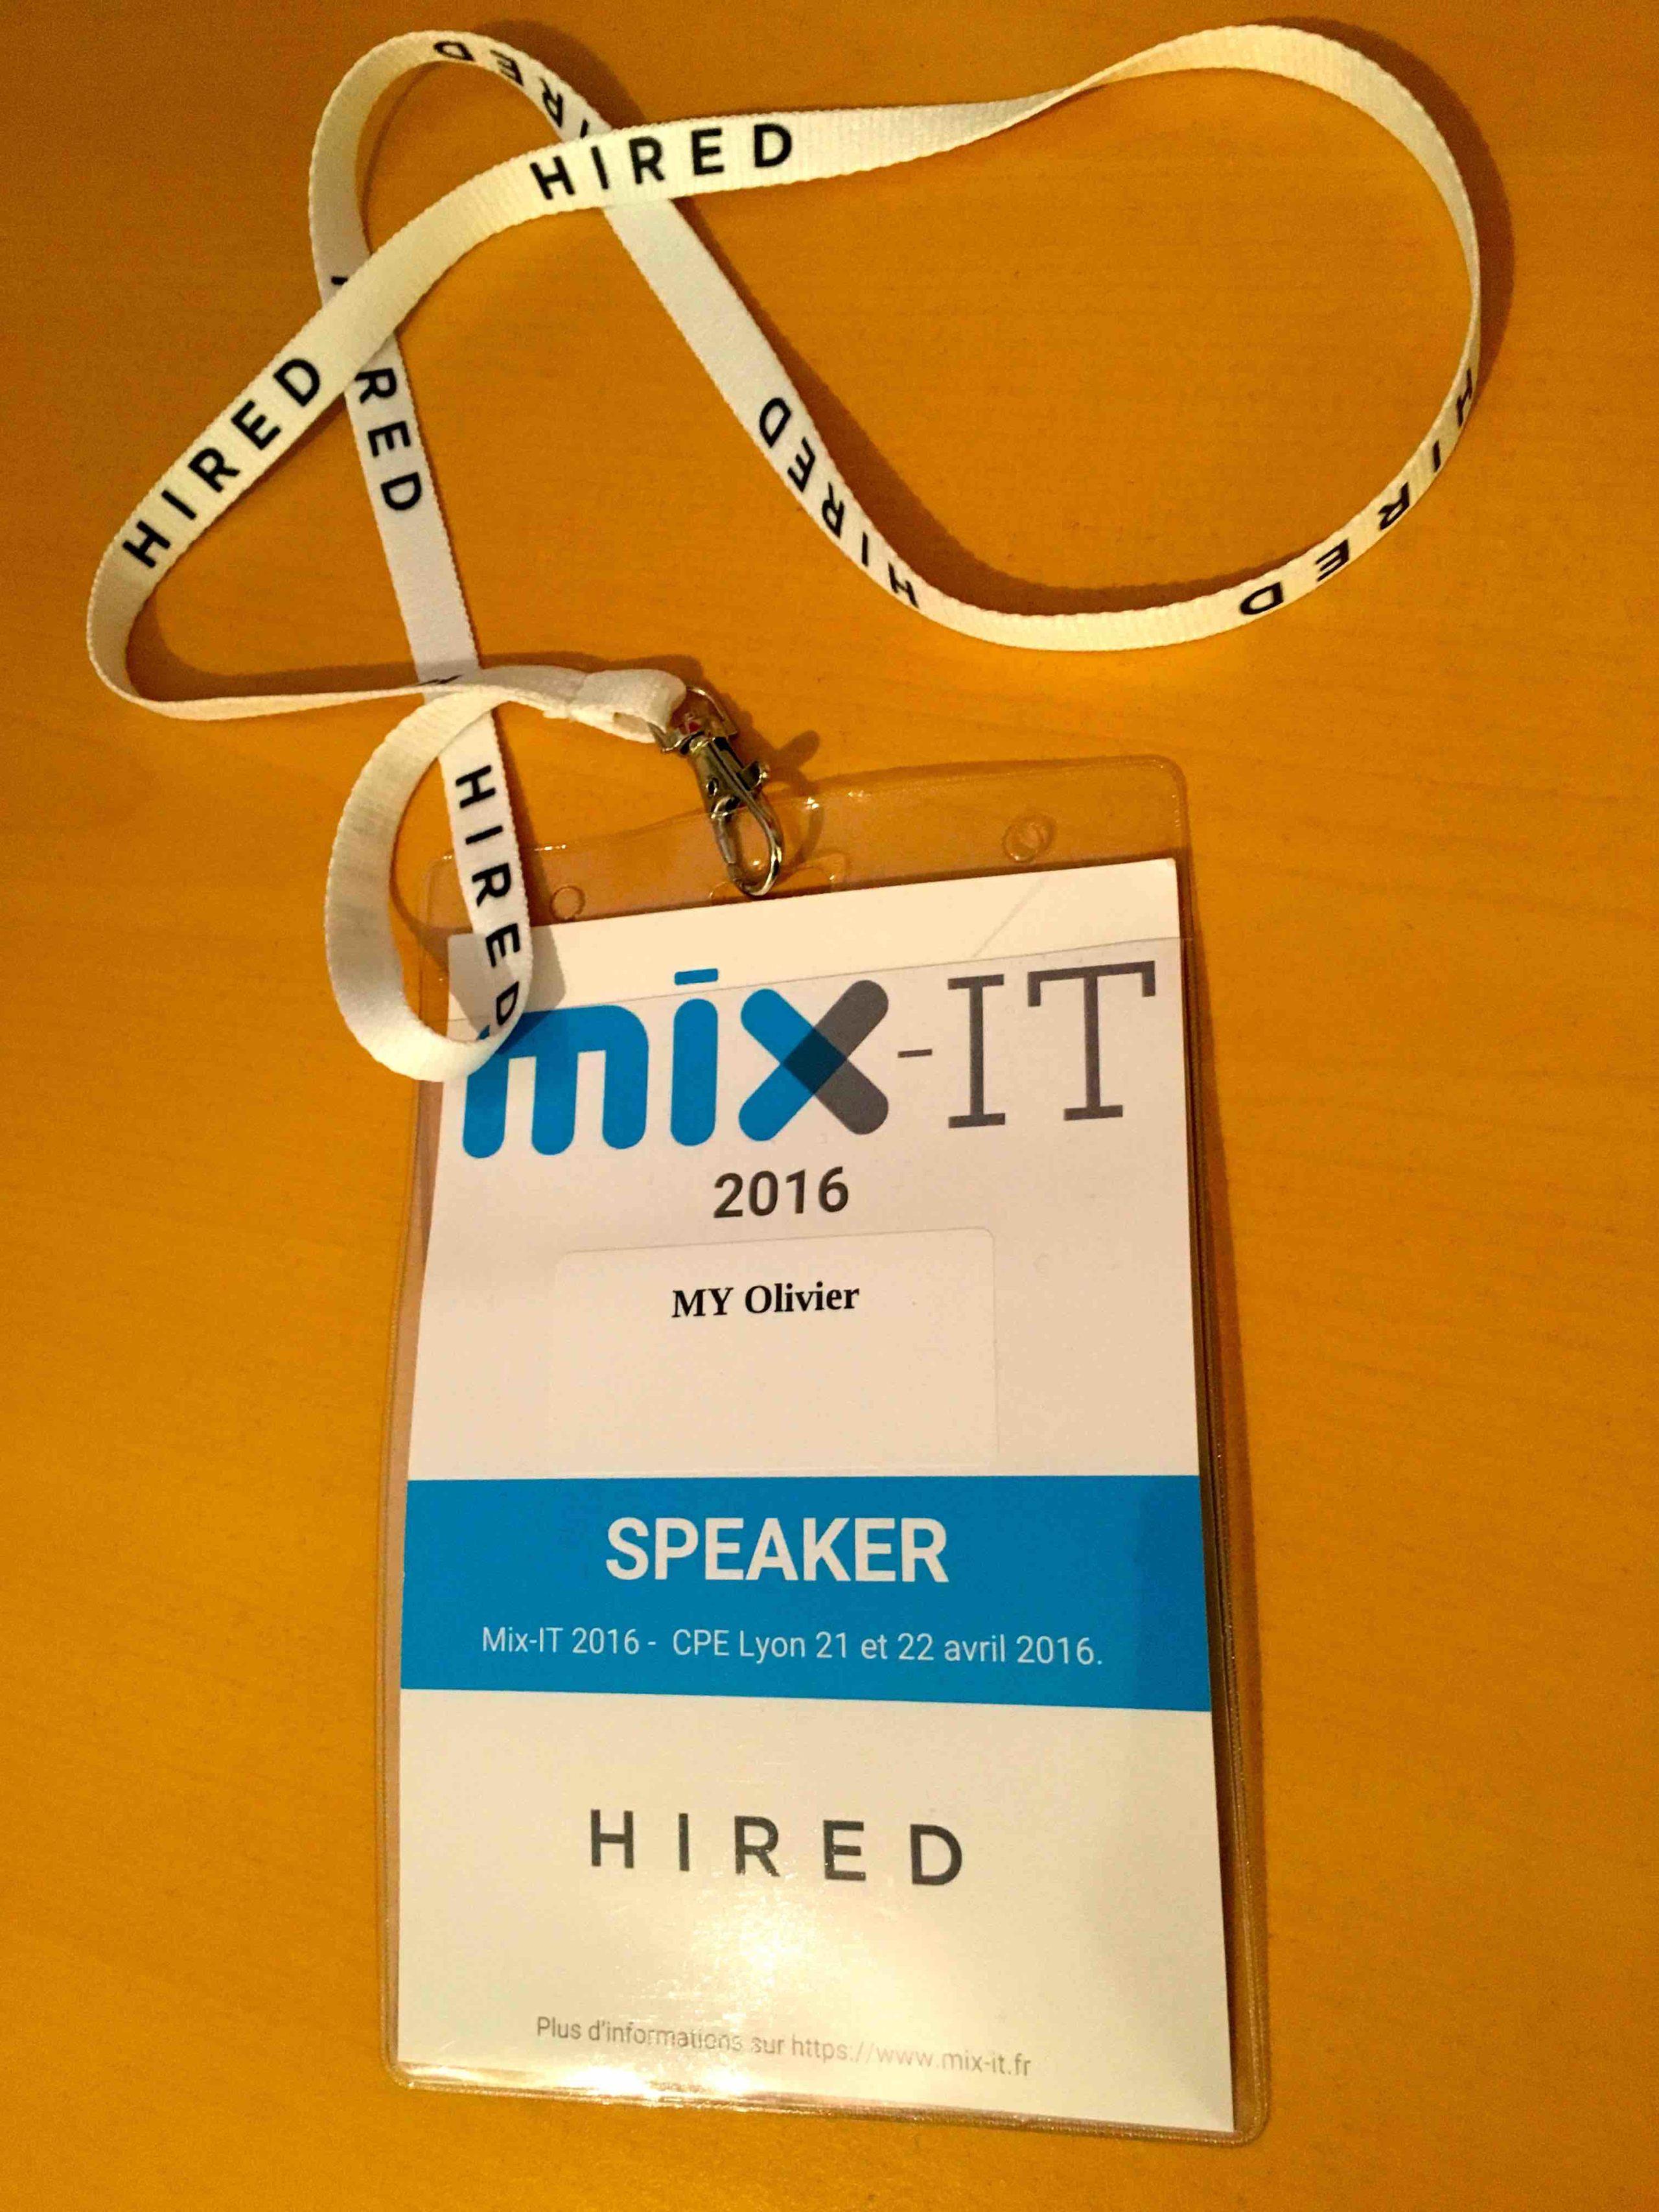 mixit_badge_1